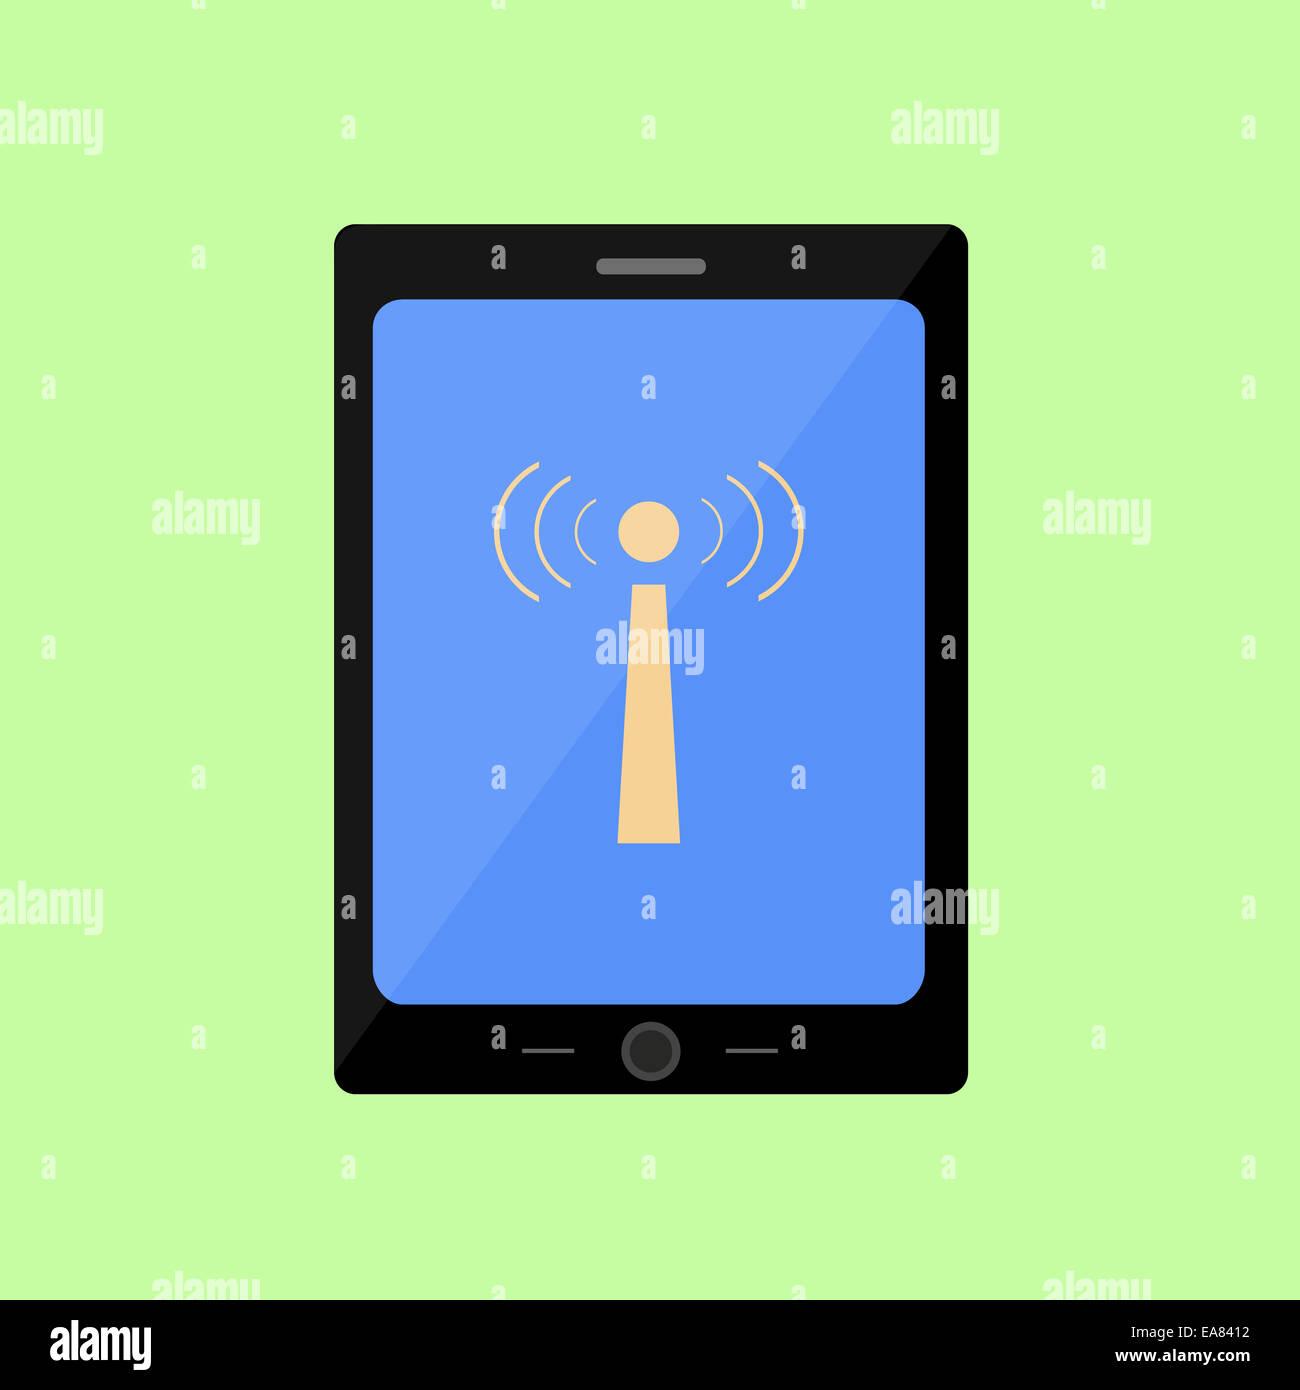 Estilo plano touch pad con icono de wi-fi Imagen De Stock